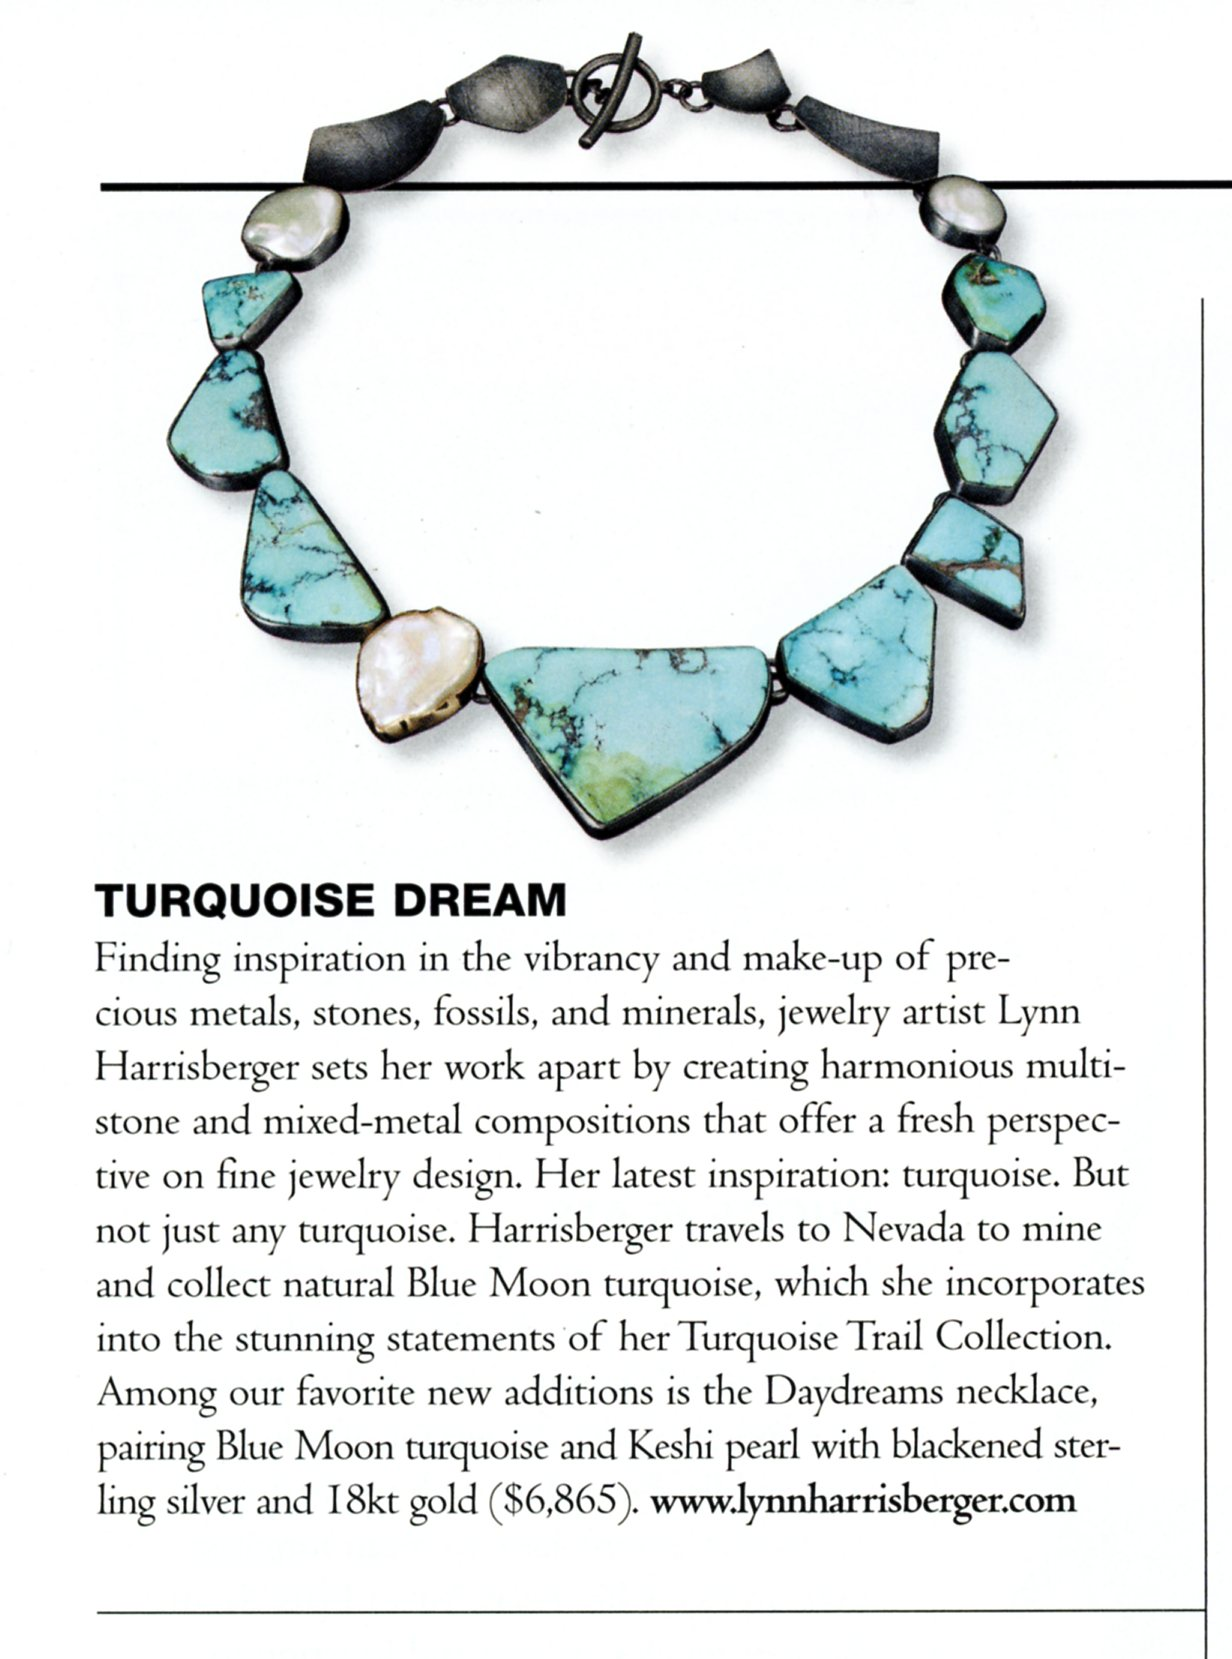 """Day Dreams"" Necklace - Lynn Harrisberger"